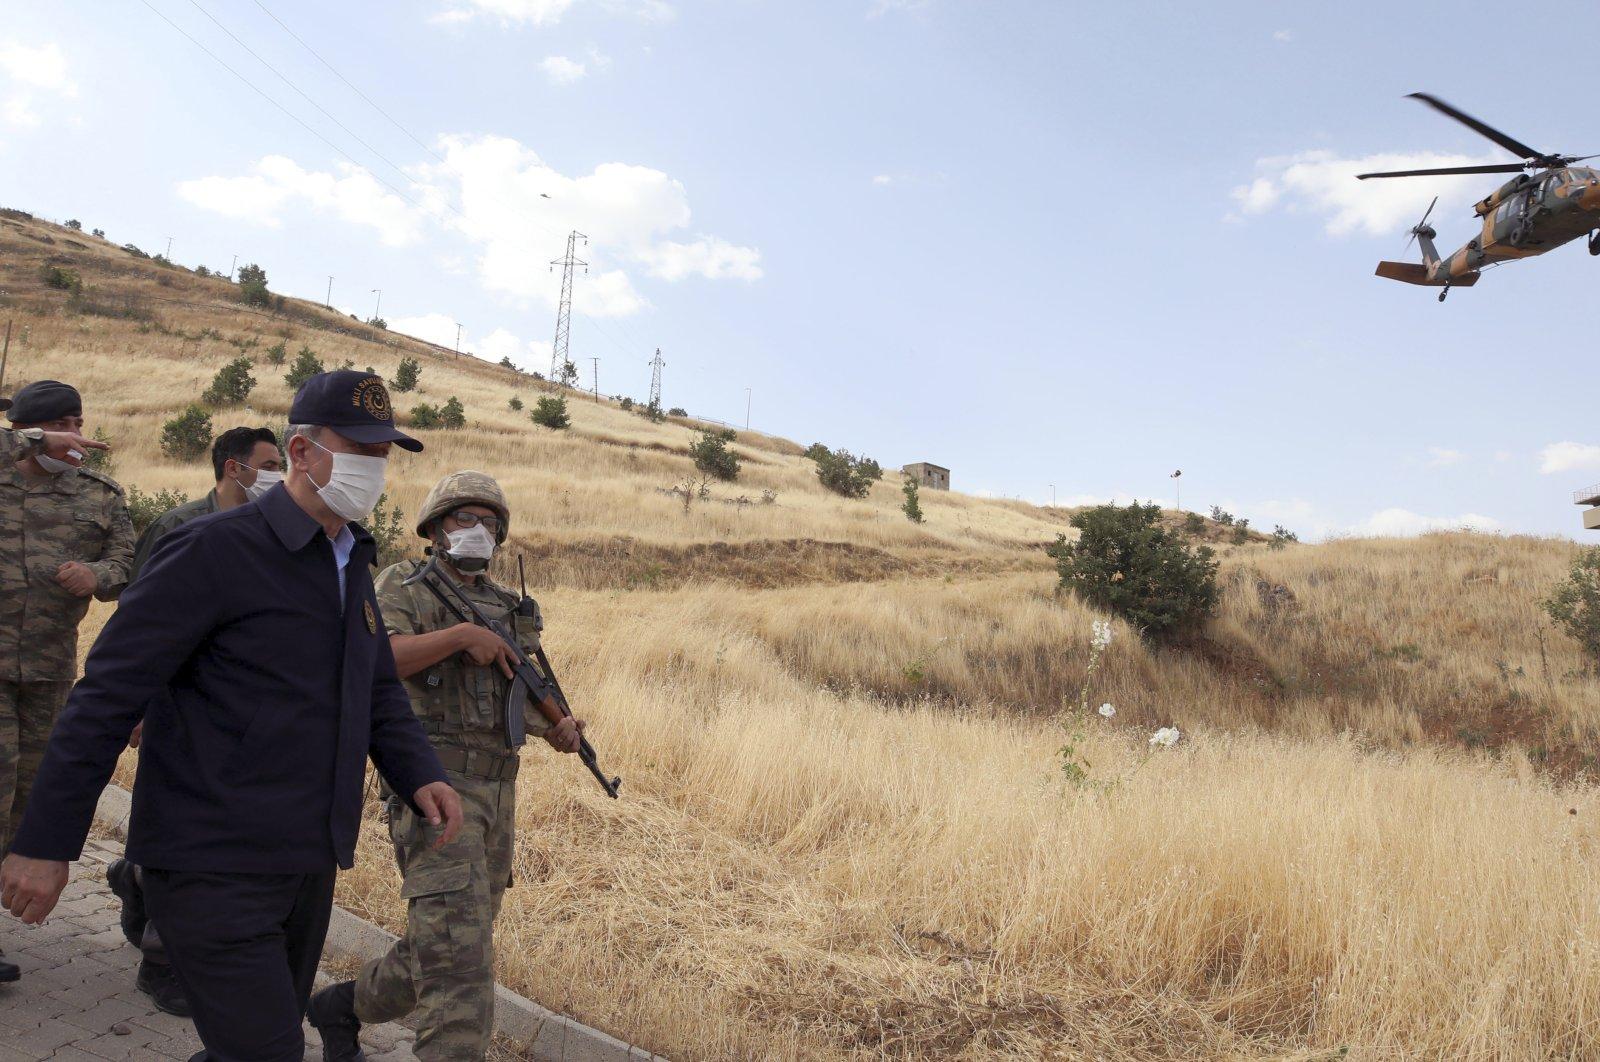 Turkish Defense Minister Hulusi Akar visits Turkish troops at the border with Iraq, in Hakkari province, Turkey, June 19, 2020. (AP Photo)